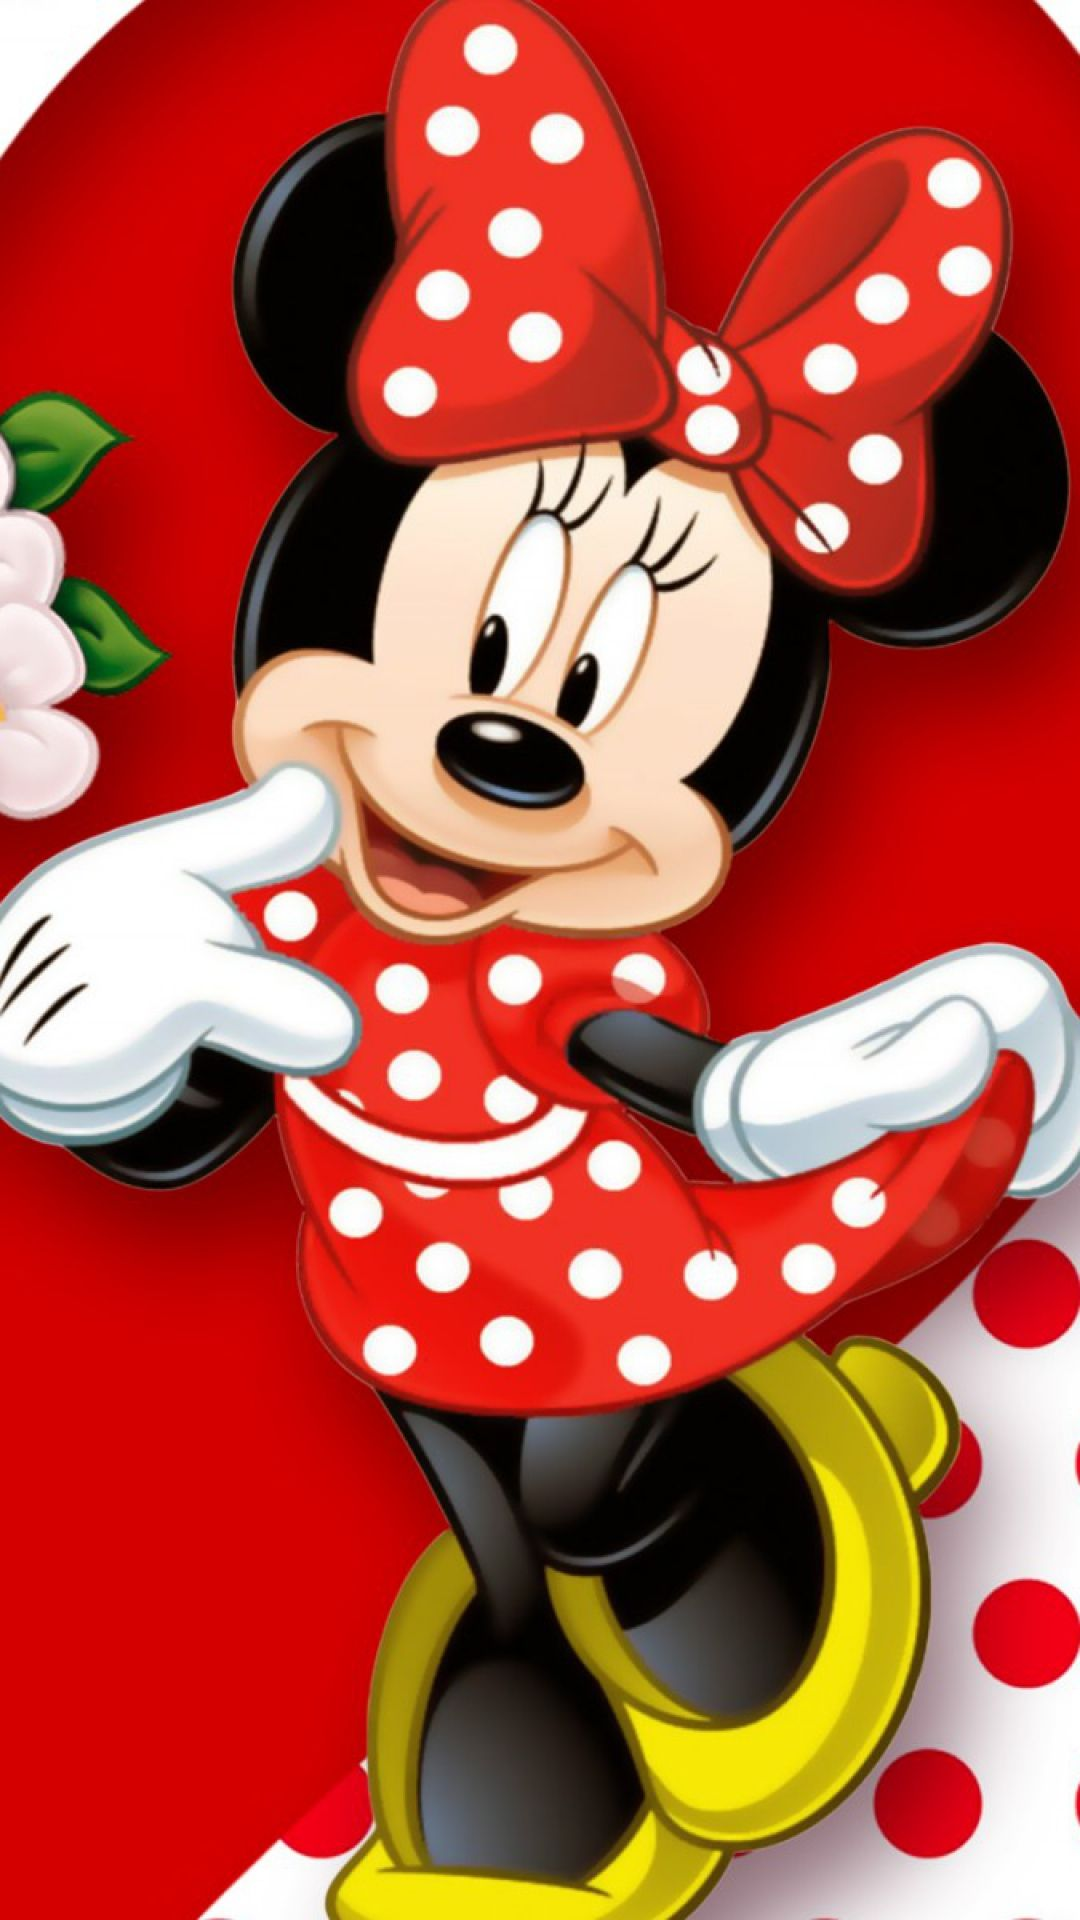 Beautiful Wallpaper Halloween Mickey Mouse - 76cdb39074e9e094db82a3bae0b4a92f  You Should Have_602429.jpg